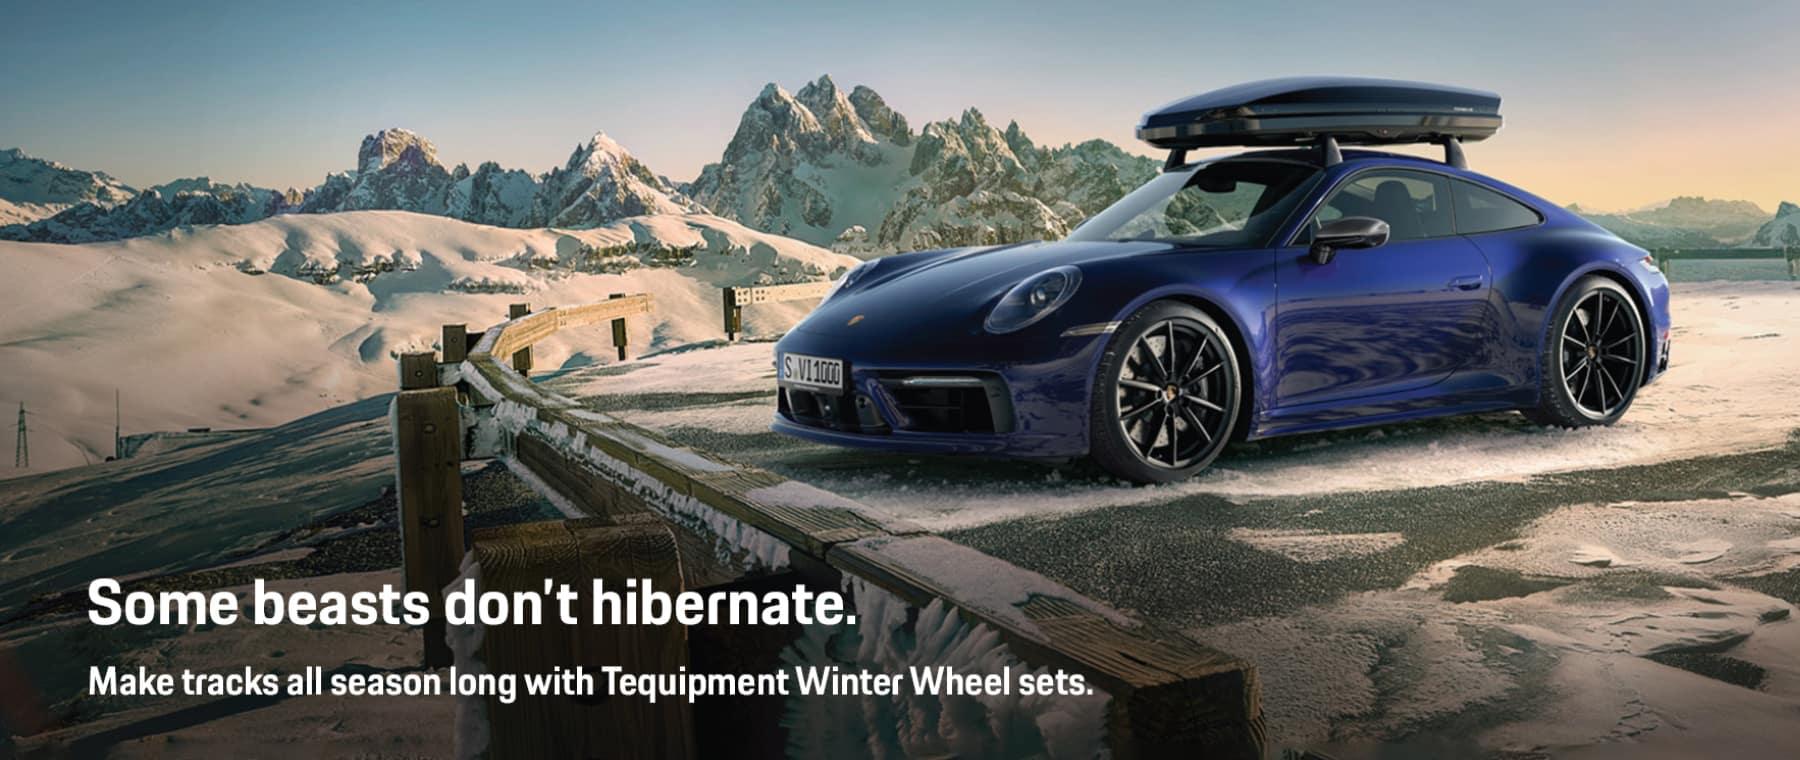 porsche-winter-wheels-hbp-v1